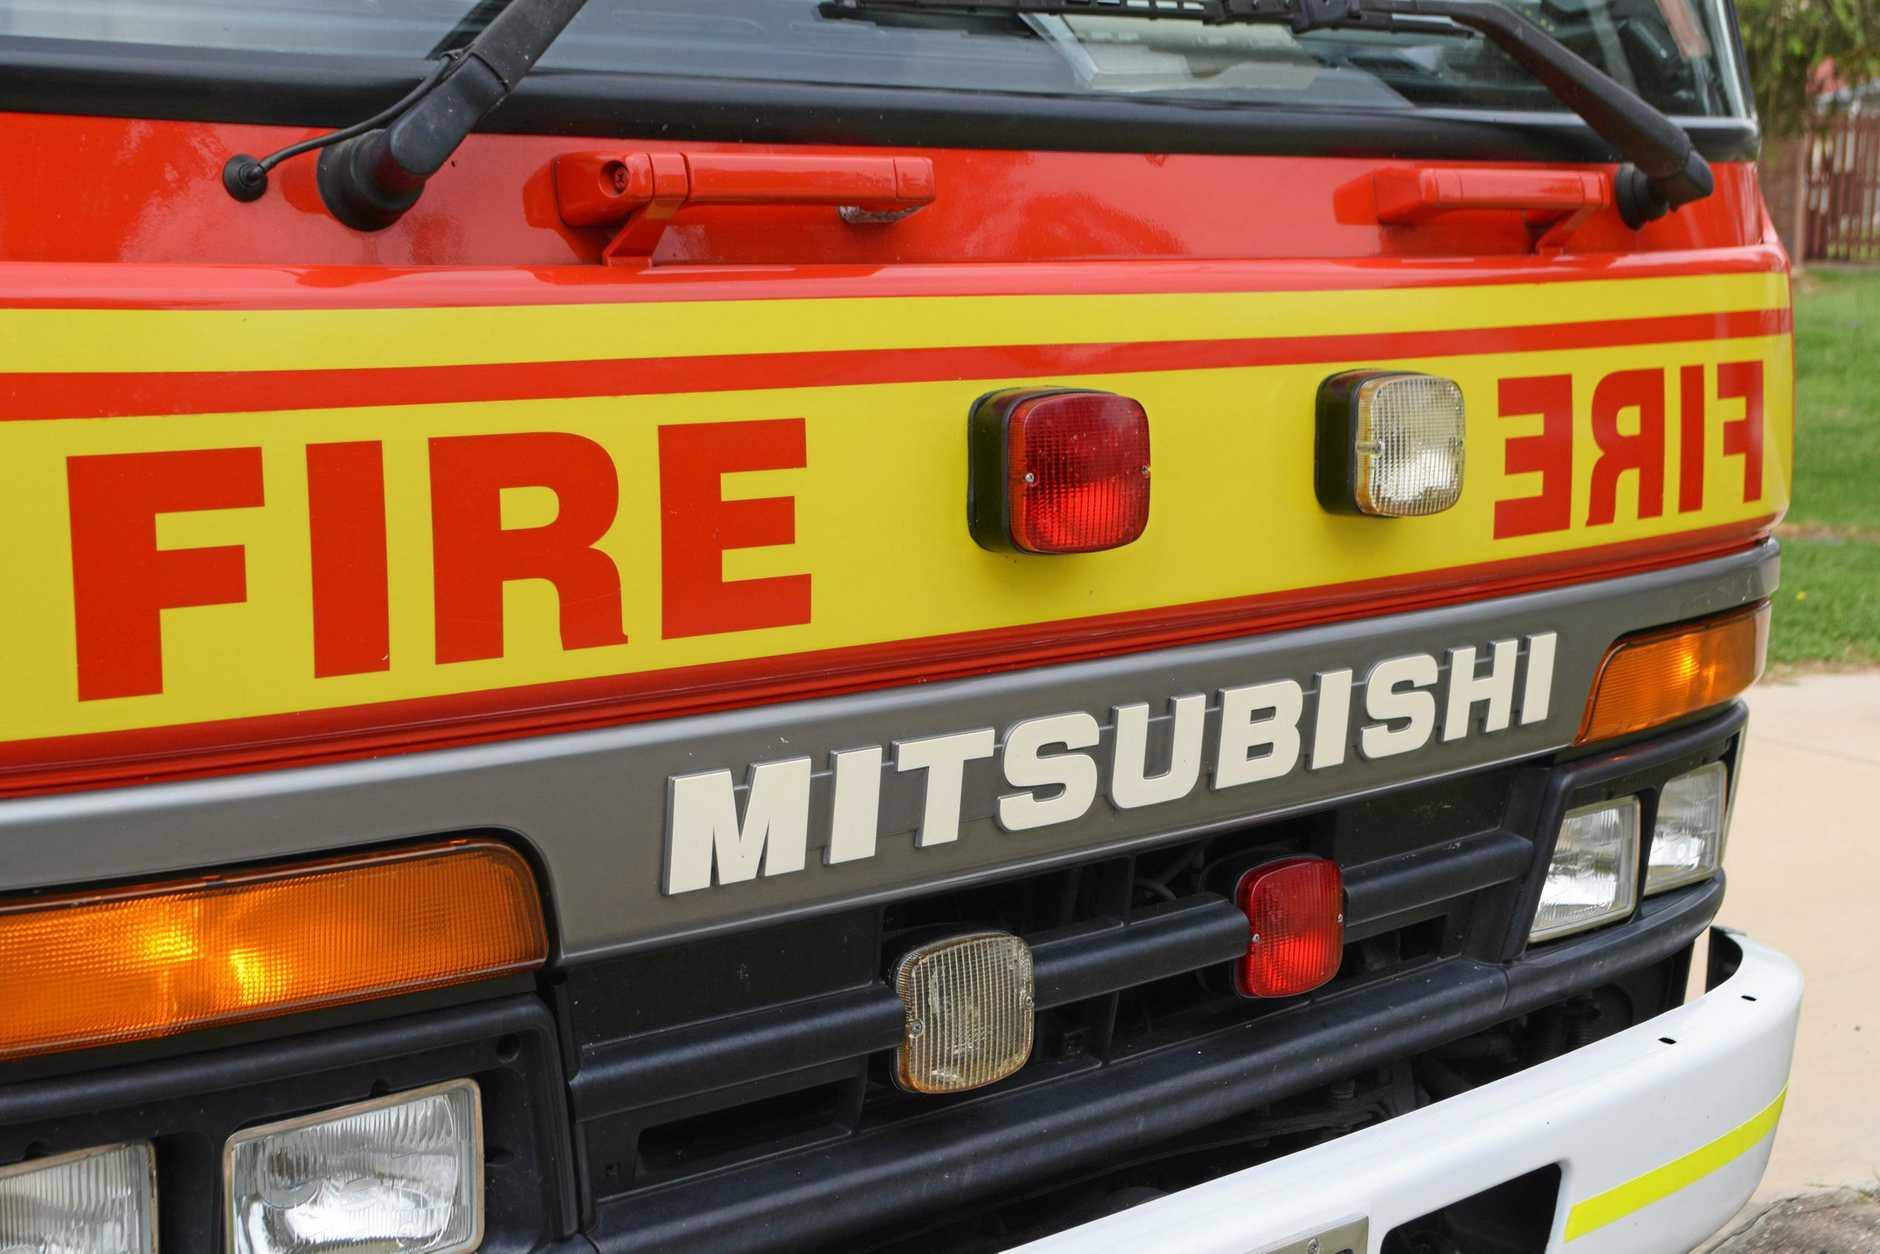 TRUCK FIRE: Emergency services attend a truck fire near Massie.